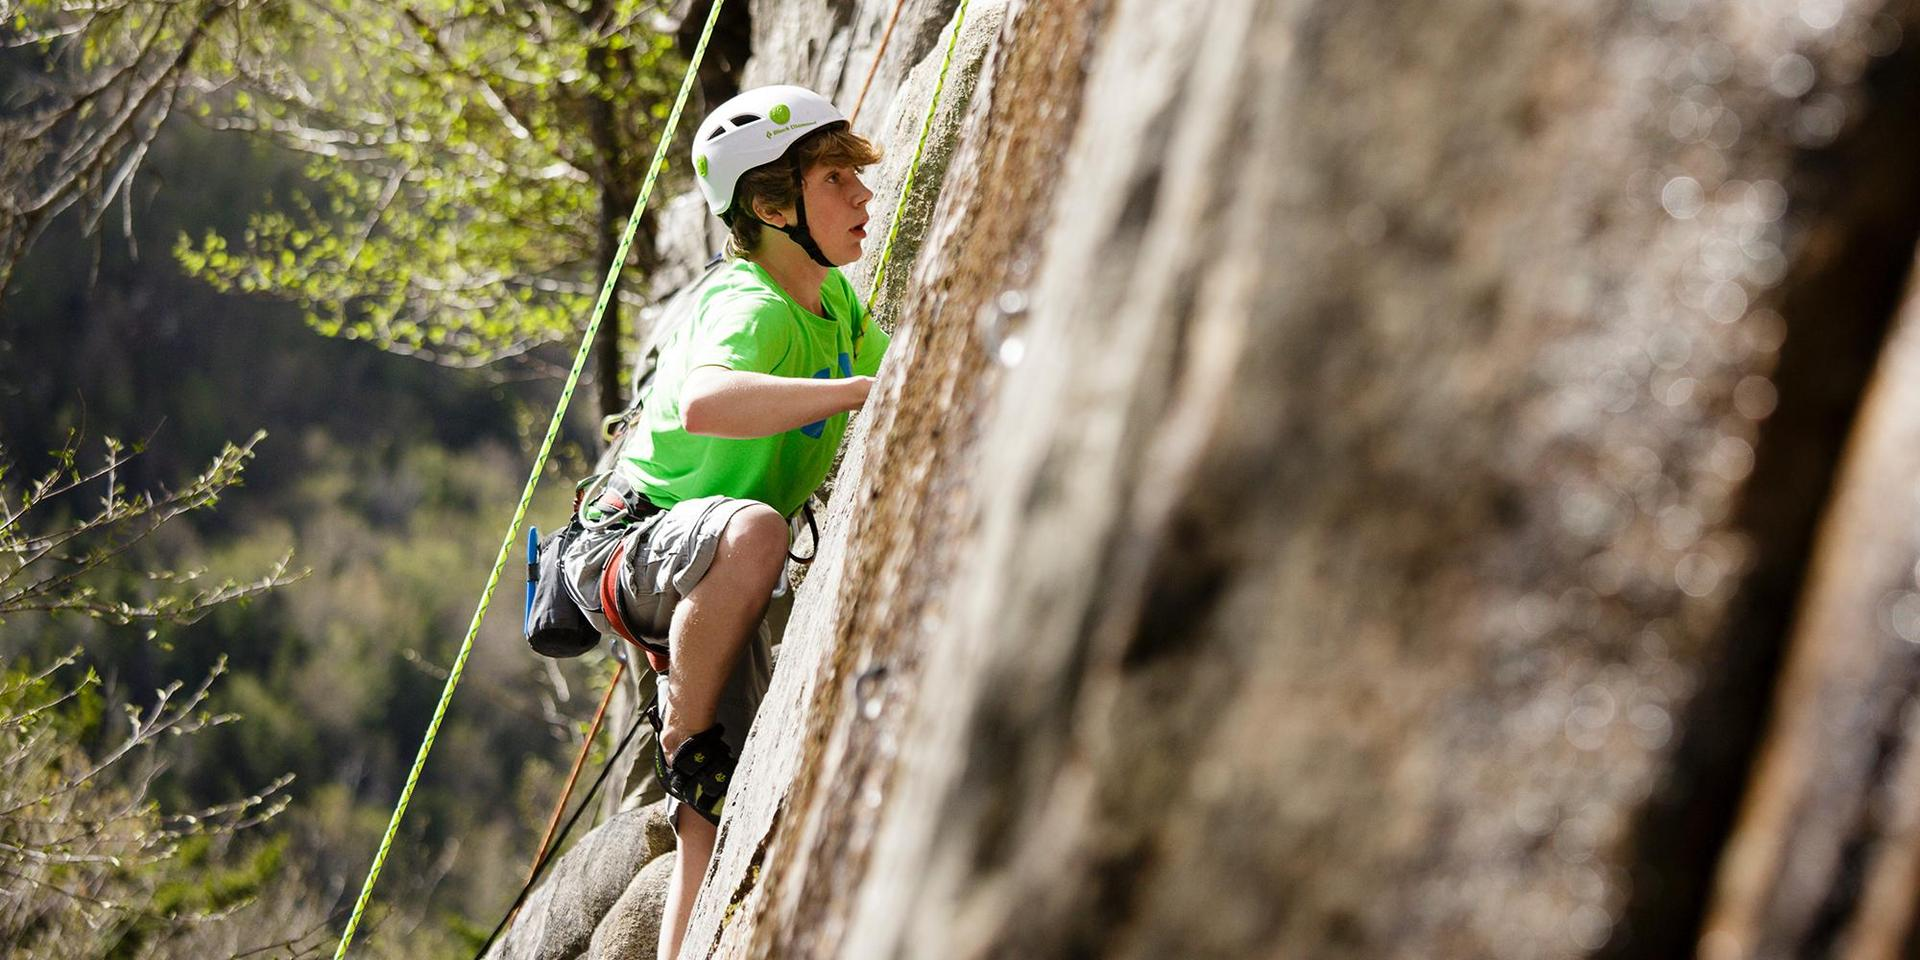 A student climbing a cliff wall.